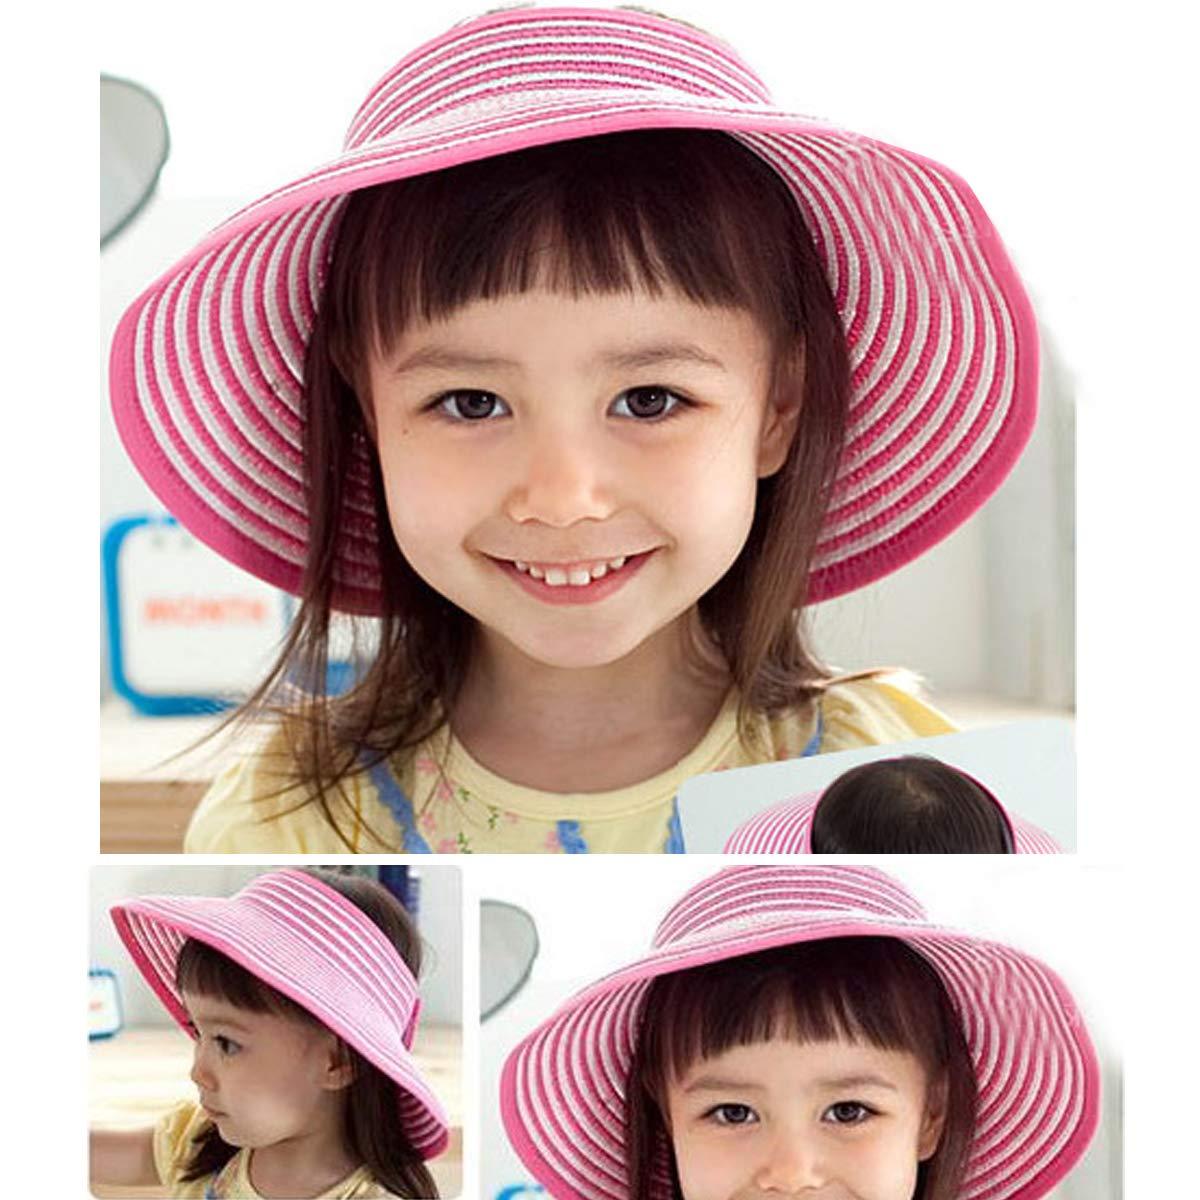 Rose Red Children Summer Sun Protection Beach Folding Wide Brim Stripe Straw Hat Cap Sunhat